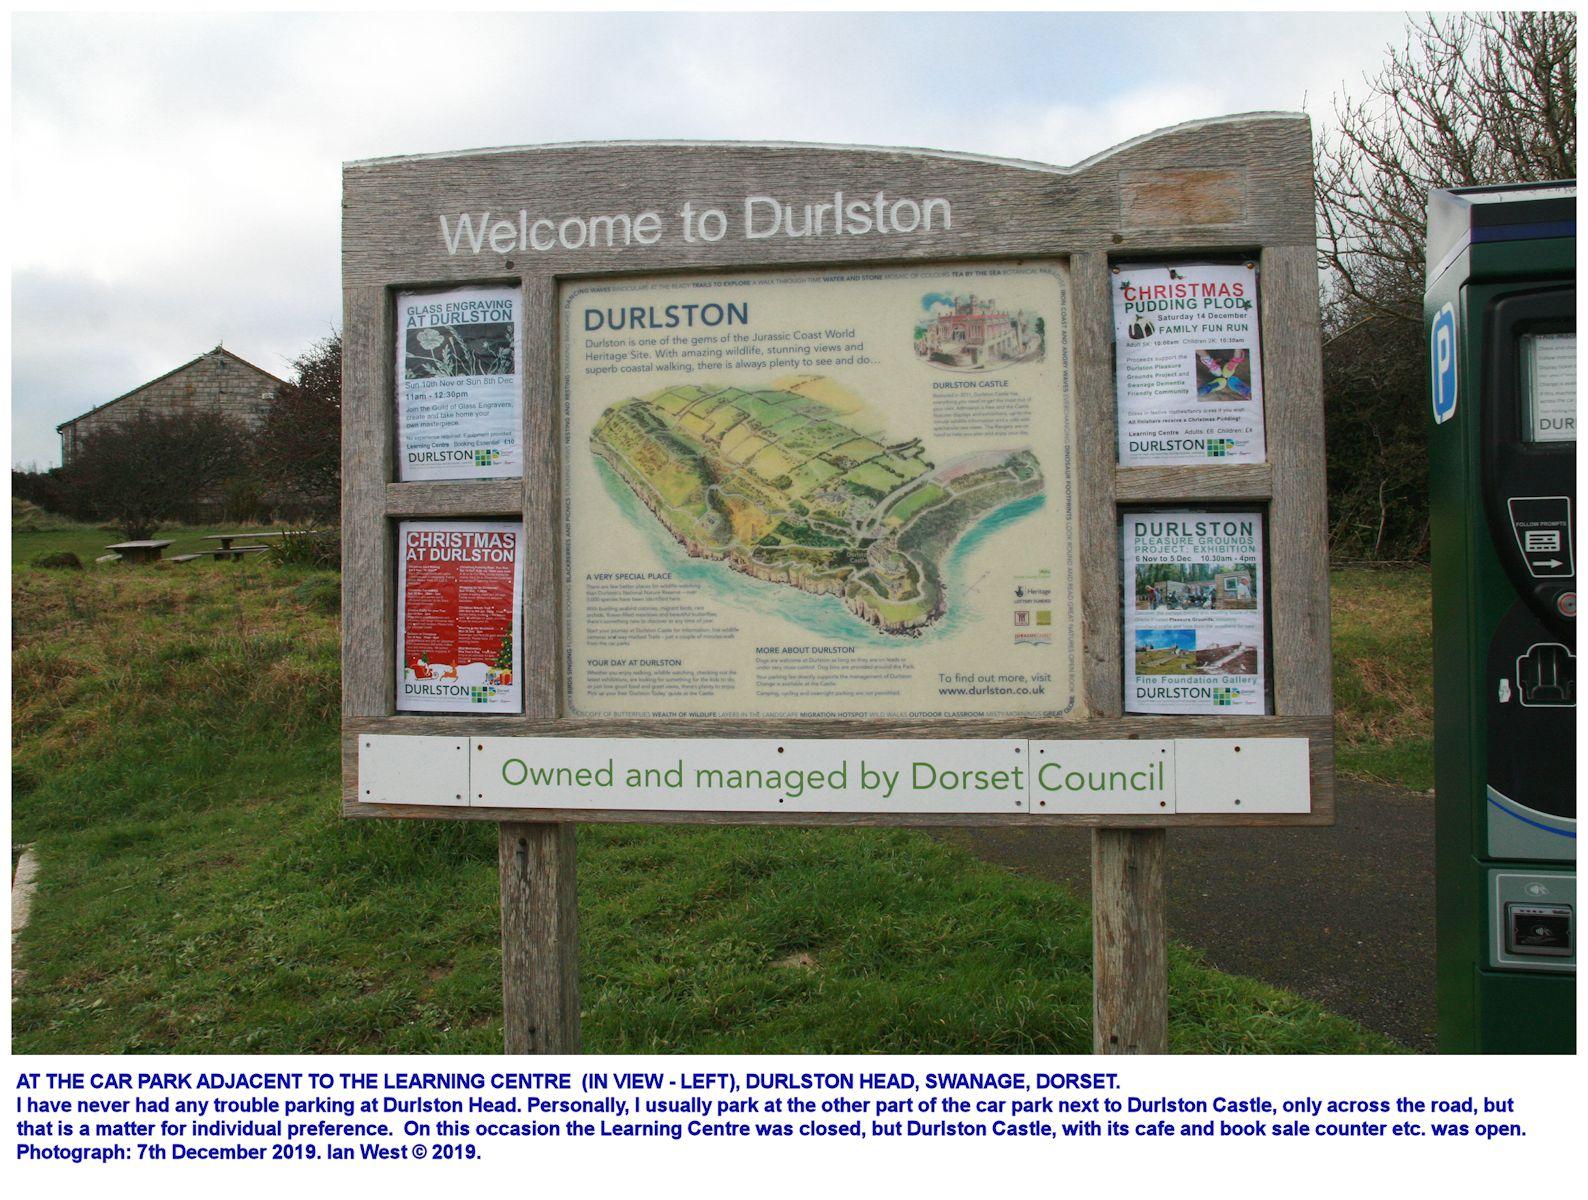 Durlston Head, Dorset, part of the car park near the Learning Centre, December 2019